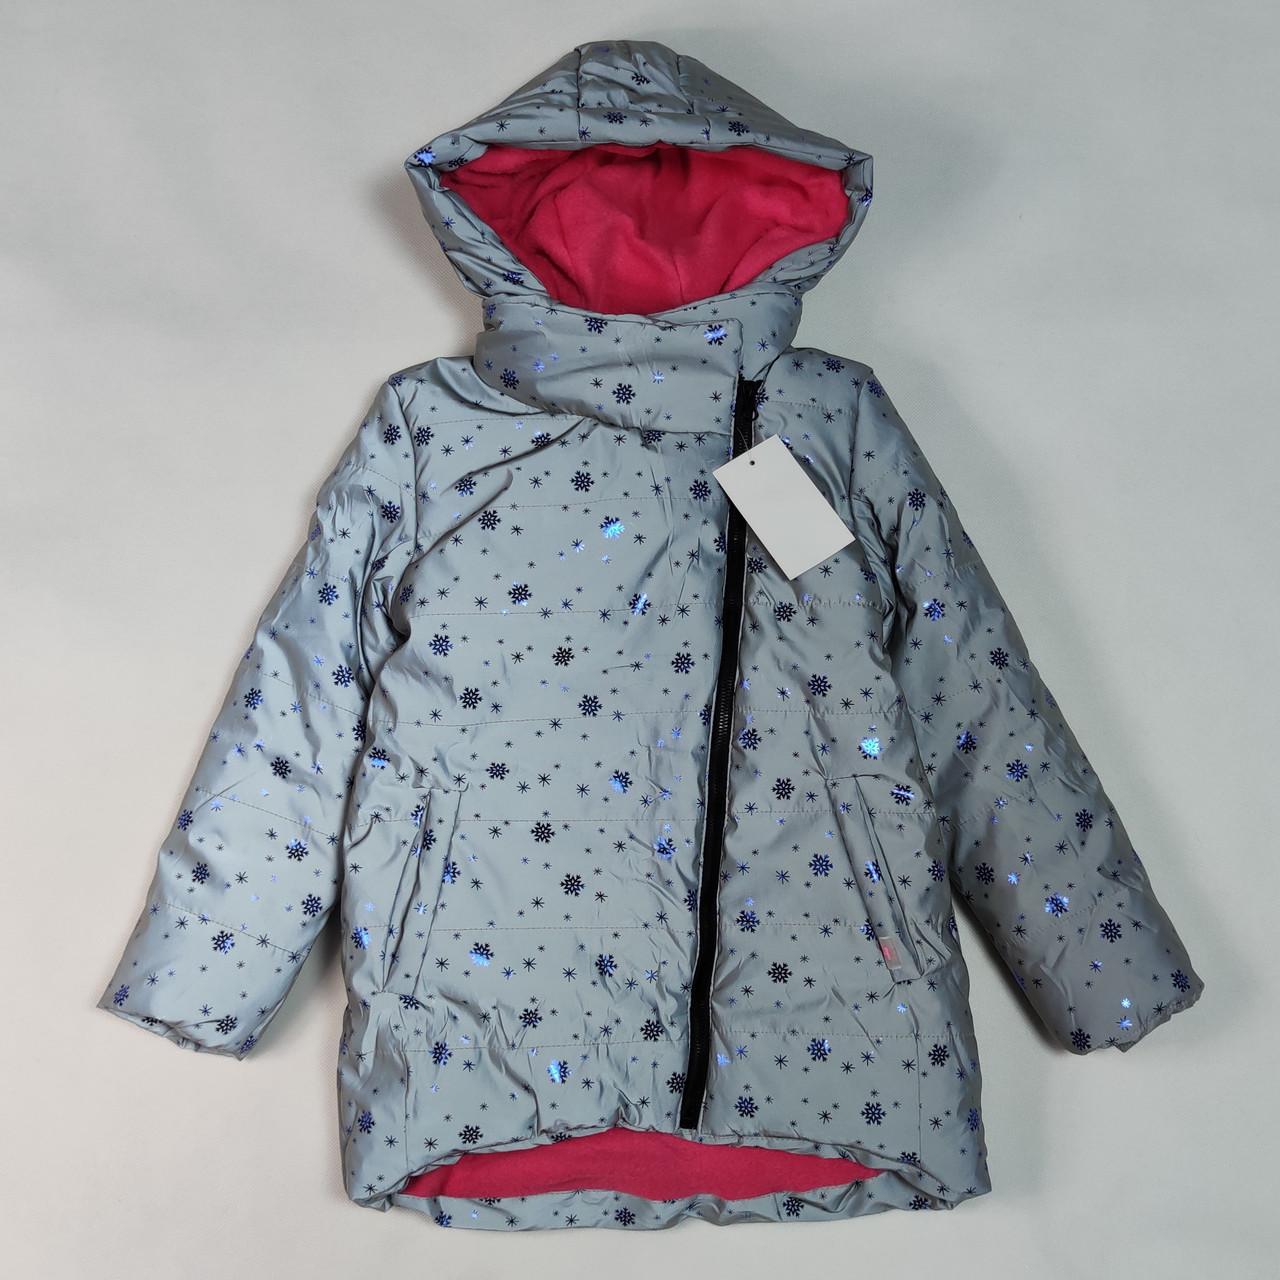 куртка для девочки зима светоотражающая